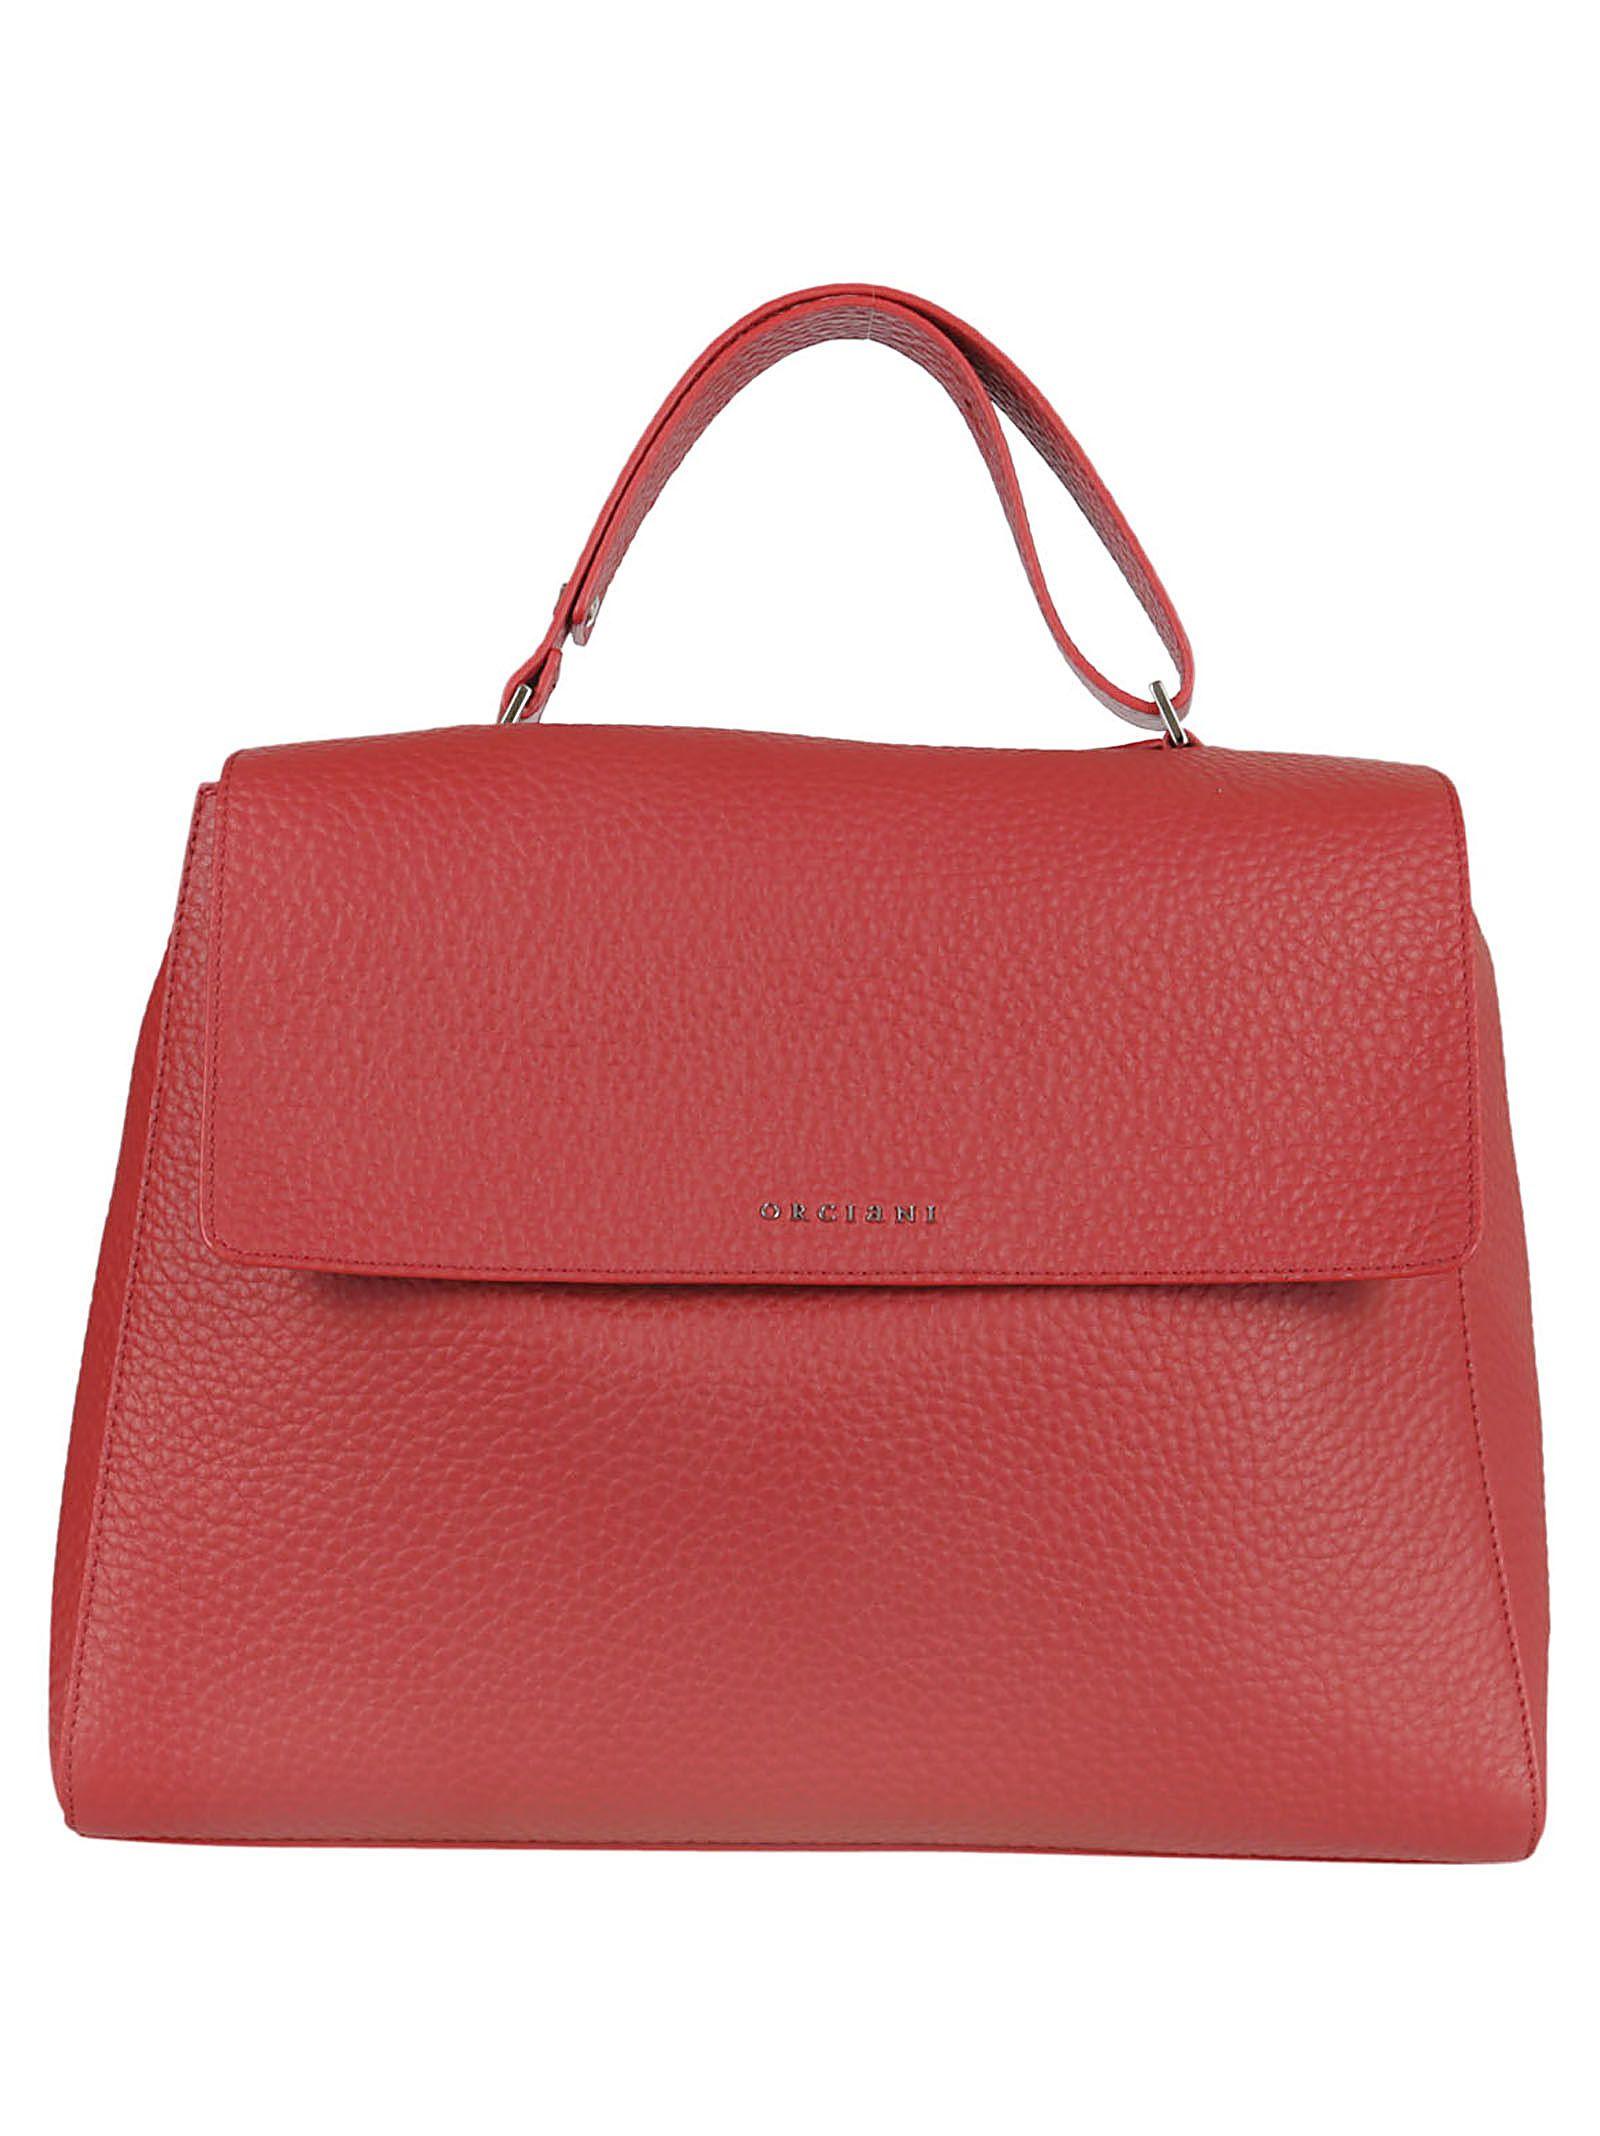 Top Handle Handbag On Sale, Orange, Leather, 2017, one size Orciani